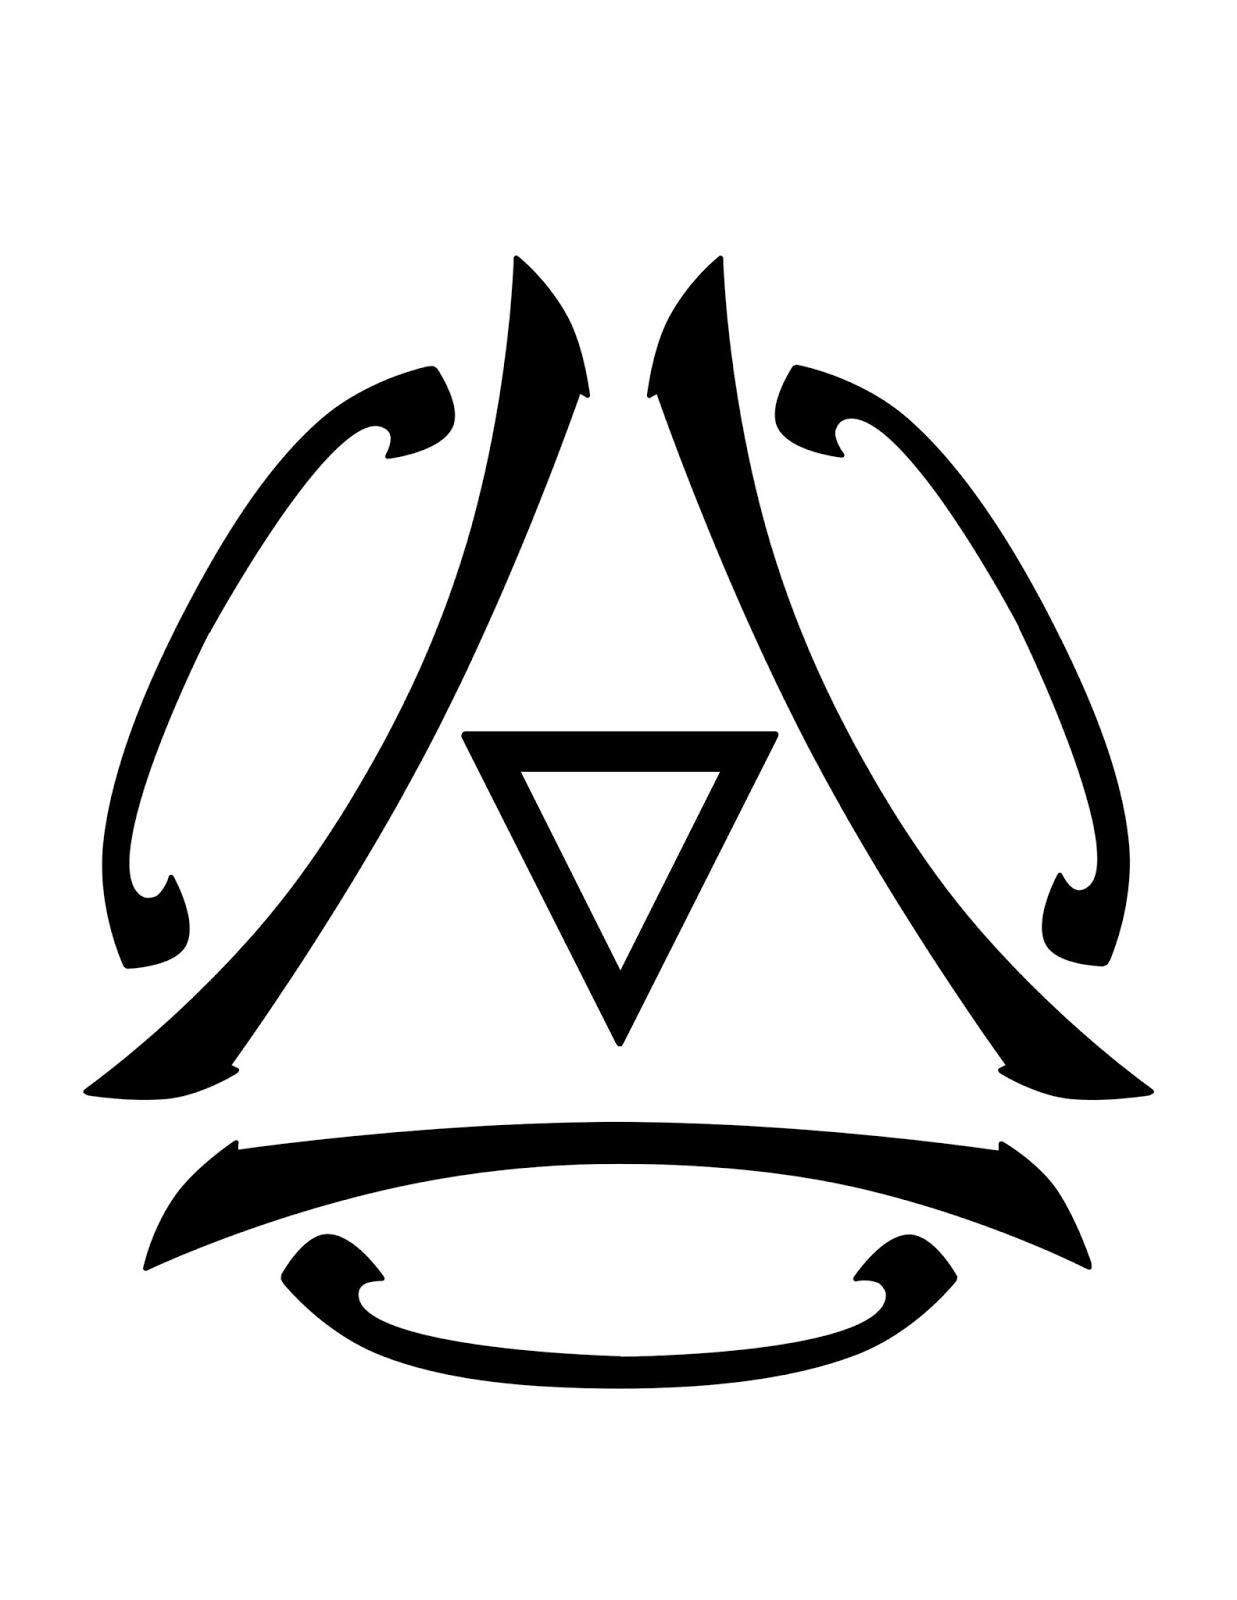 Greek God Symbols Ares